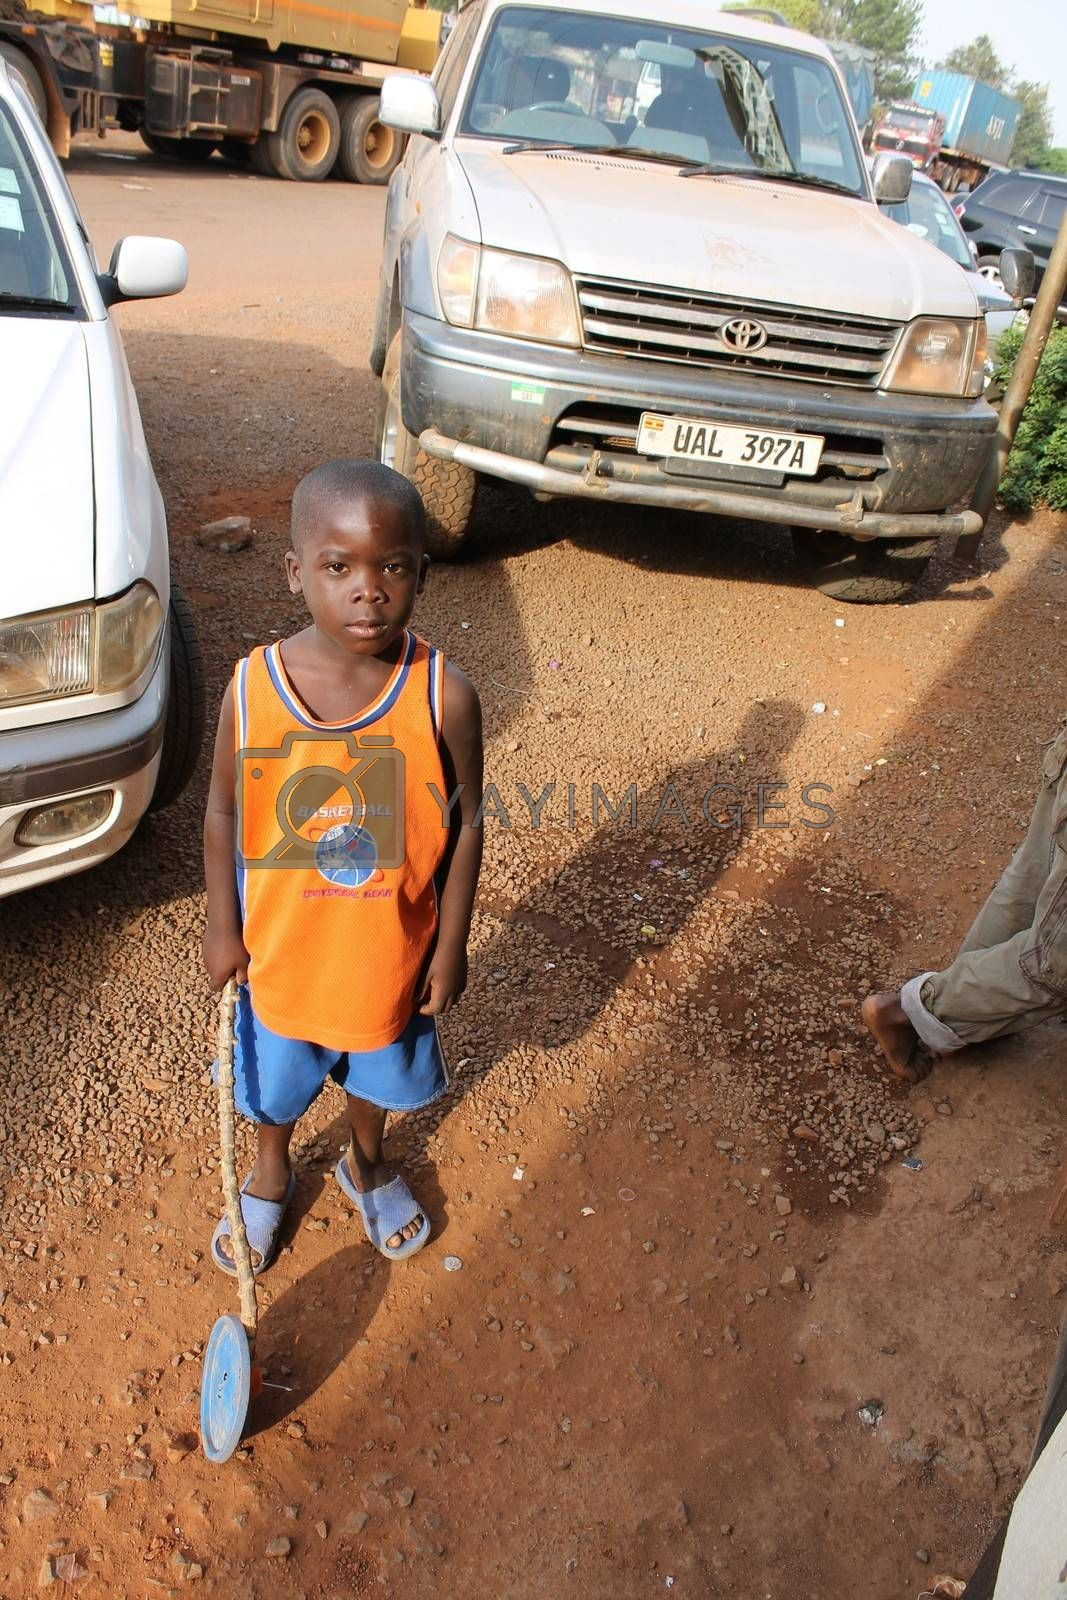 ugandan boy by Mieszko9